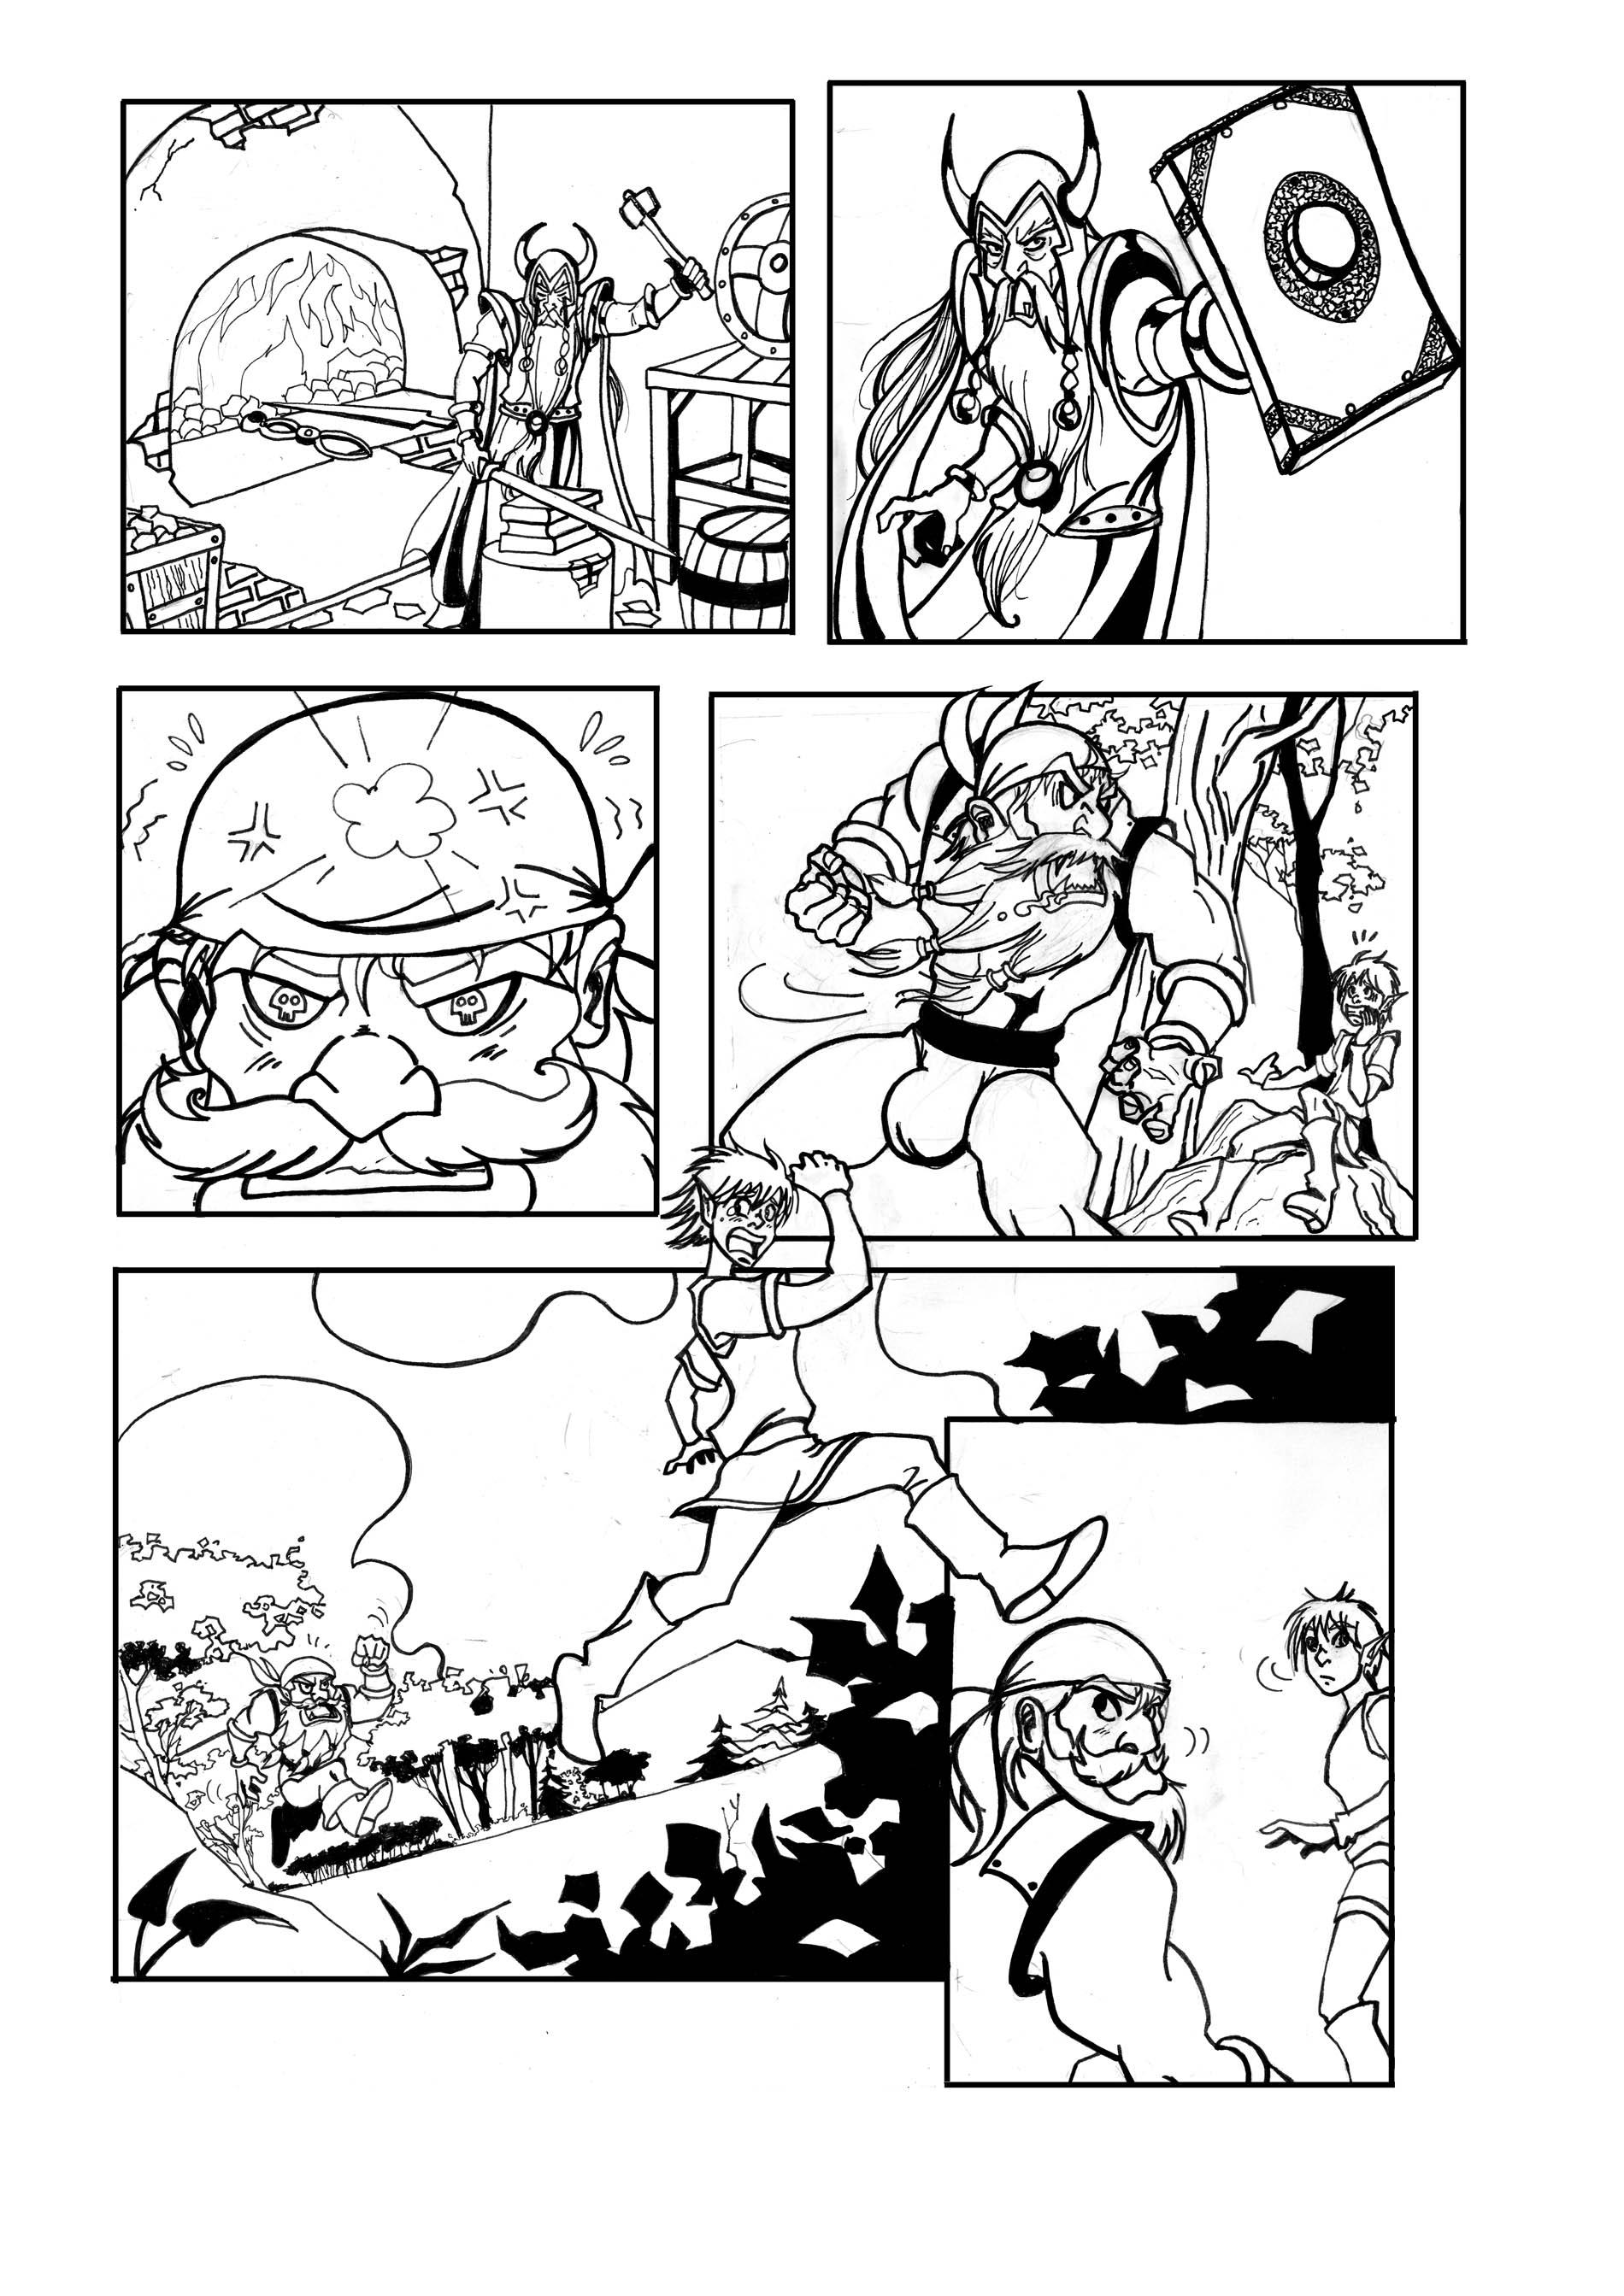 Comic project 2